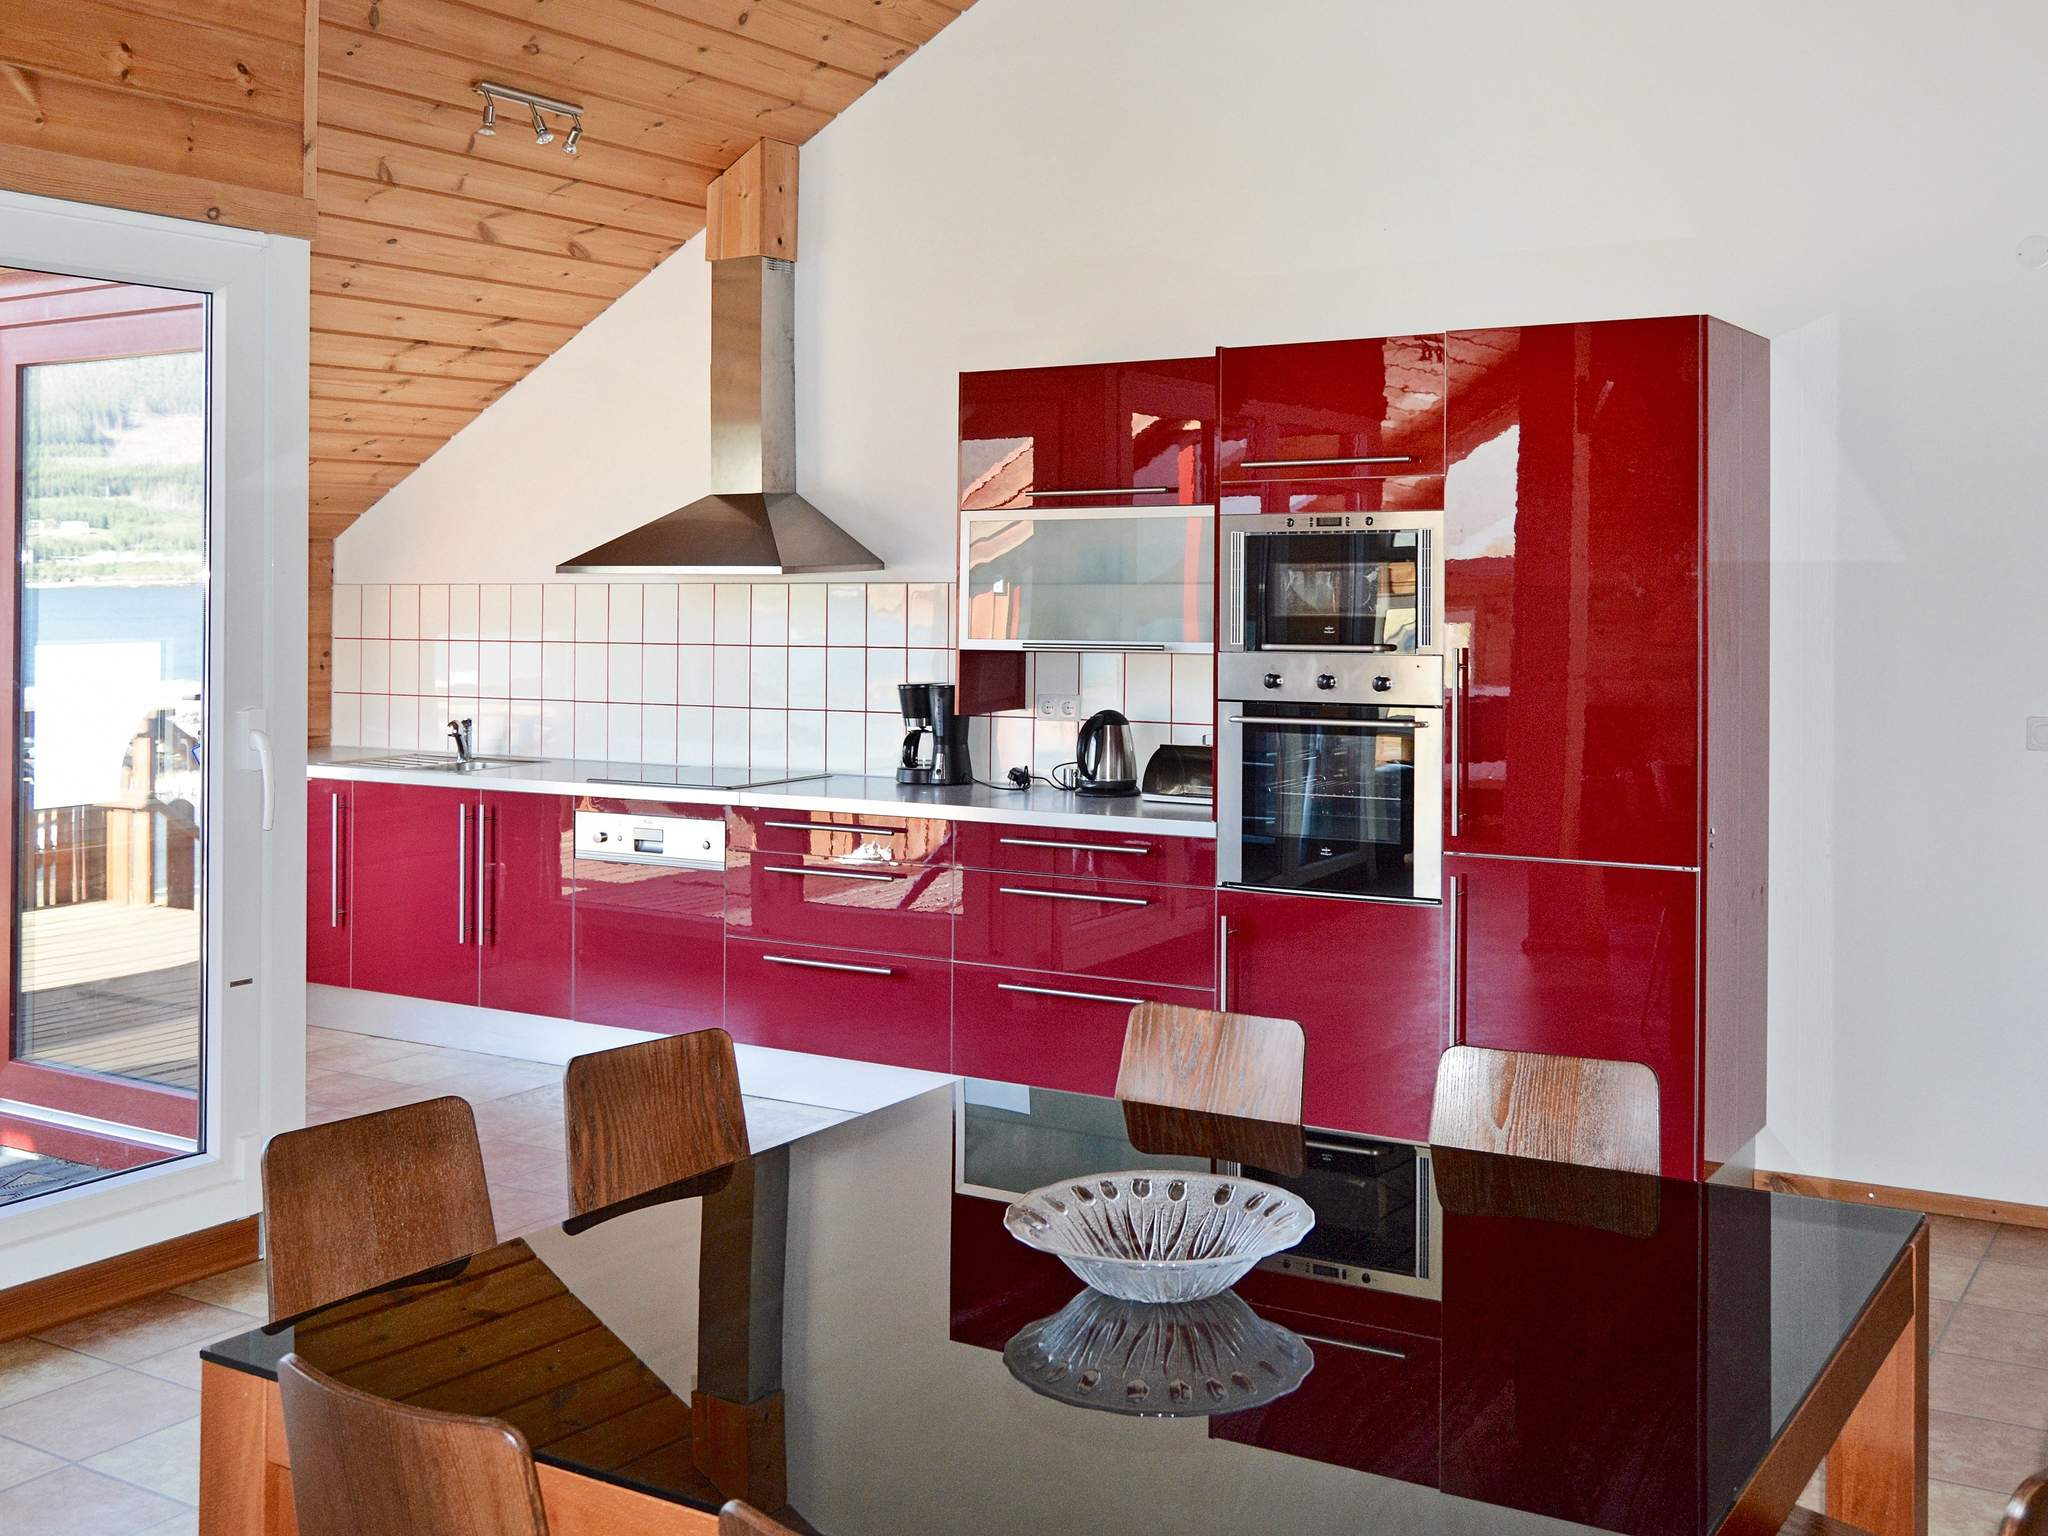 Ferienhaus Eidsvåg (135541), Eidsvåg, More - Romsdal, Westnorwegen, Norwegen, Bild 10